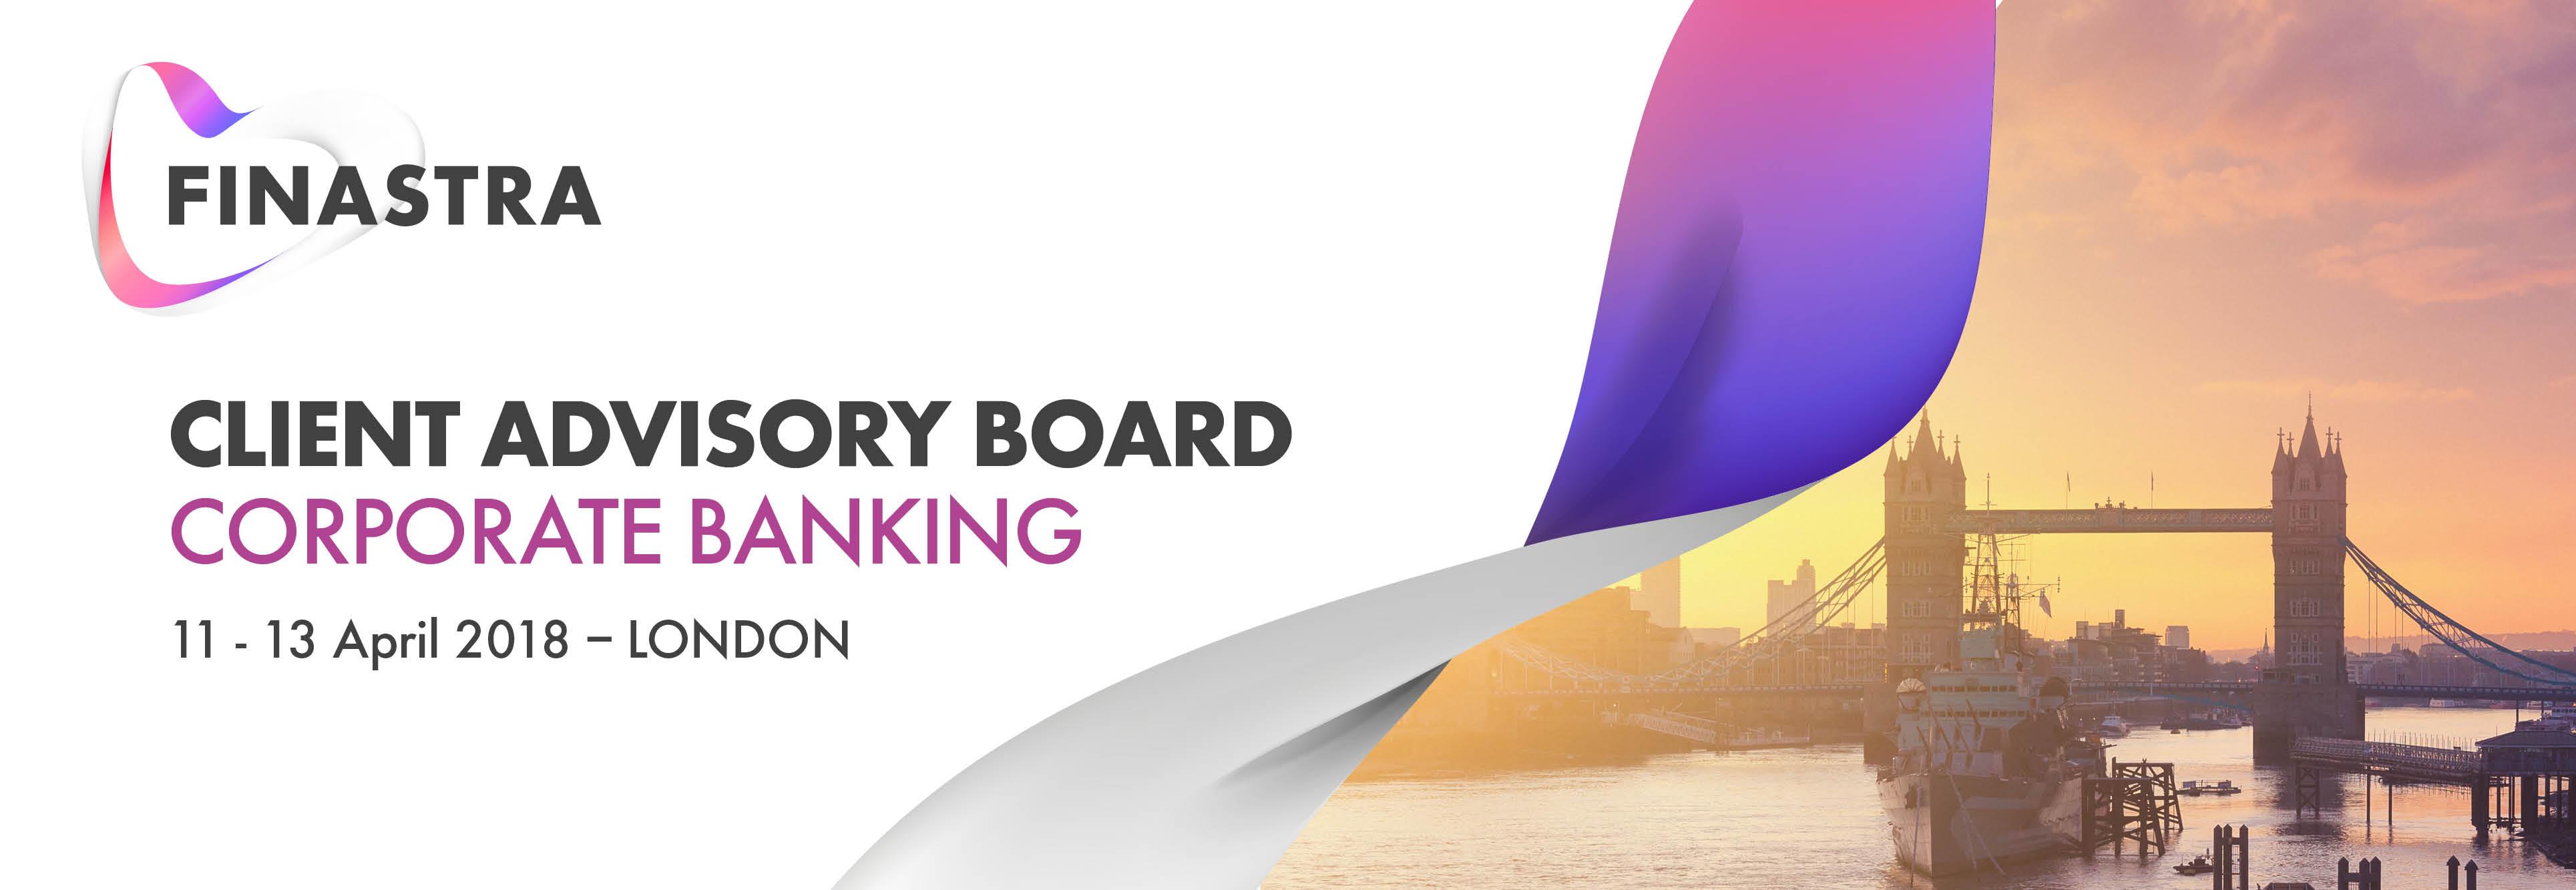 2018 Finastra Corporate Banking Client Advisory Board (London)